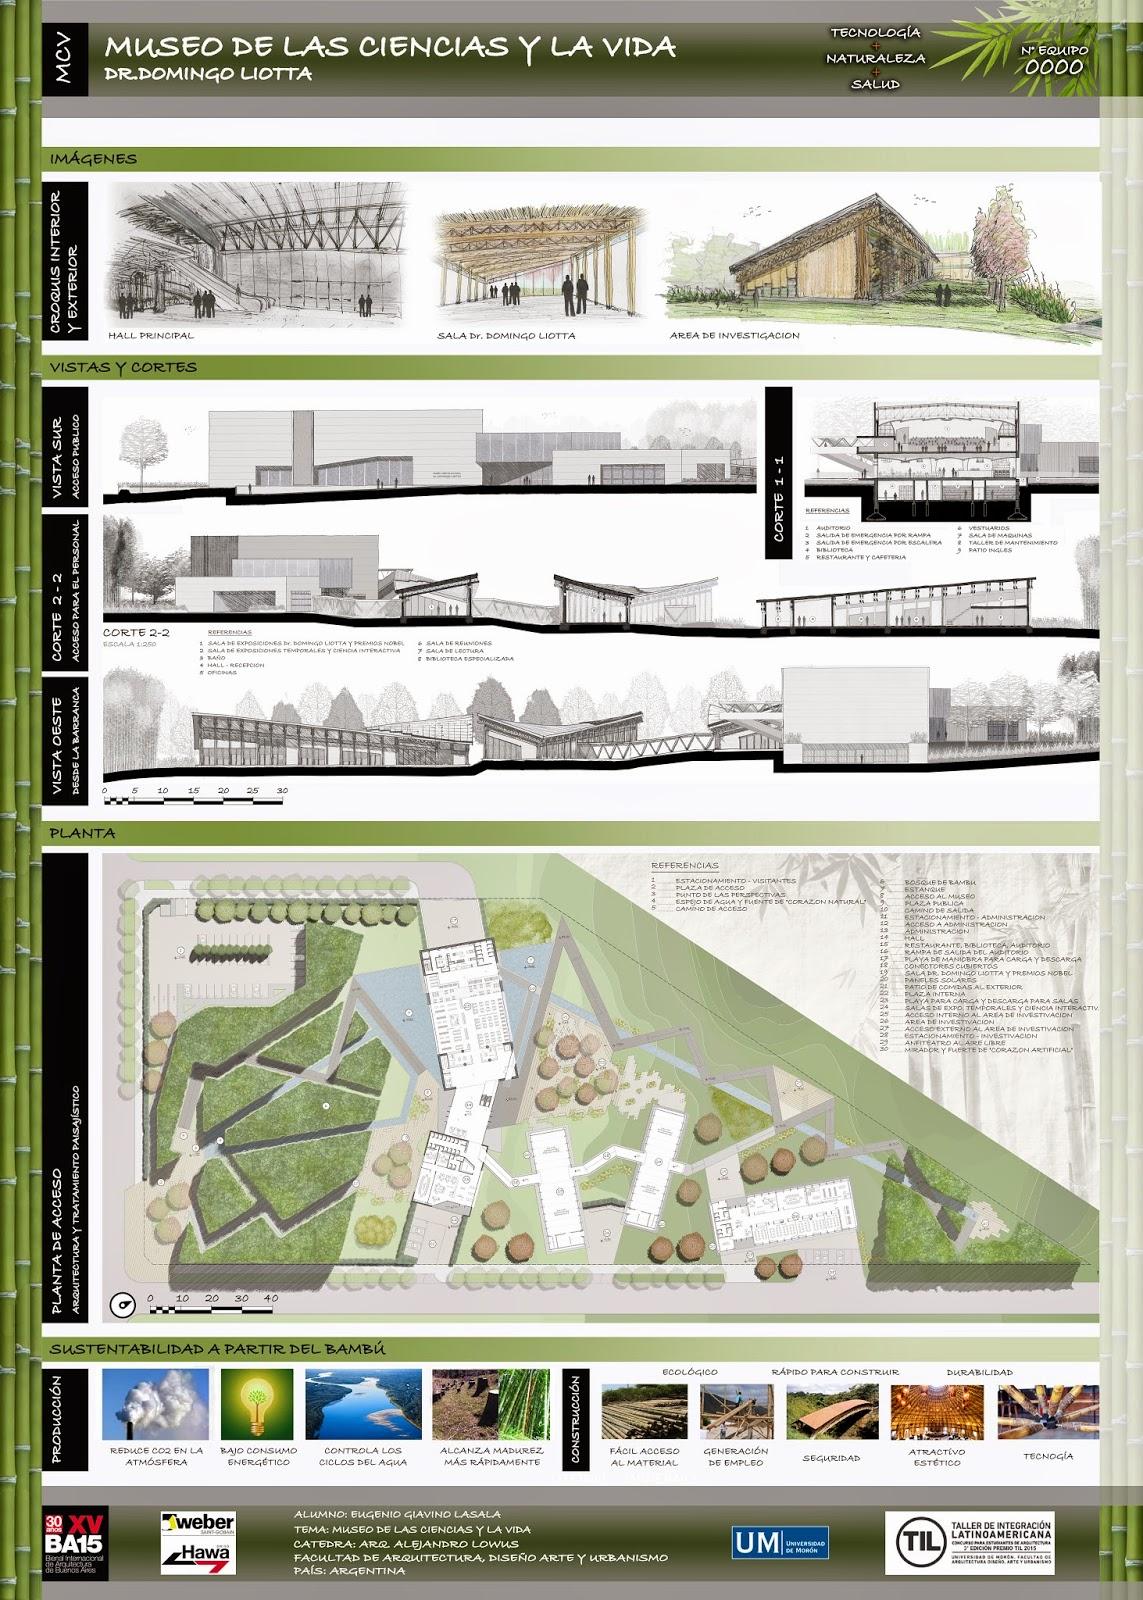 Eugenio giavino lasala laminas para el concurso premio for Laminas arquitectura